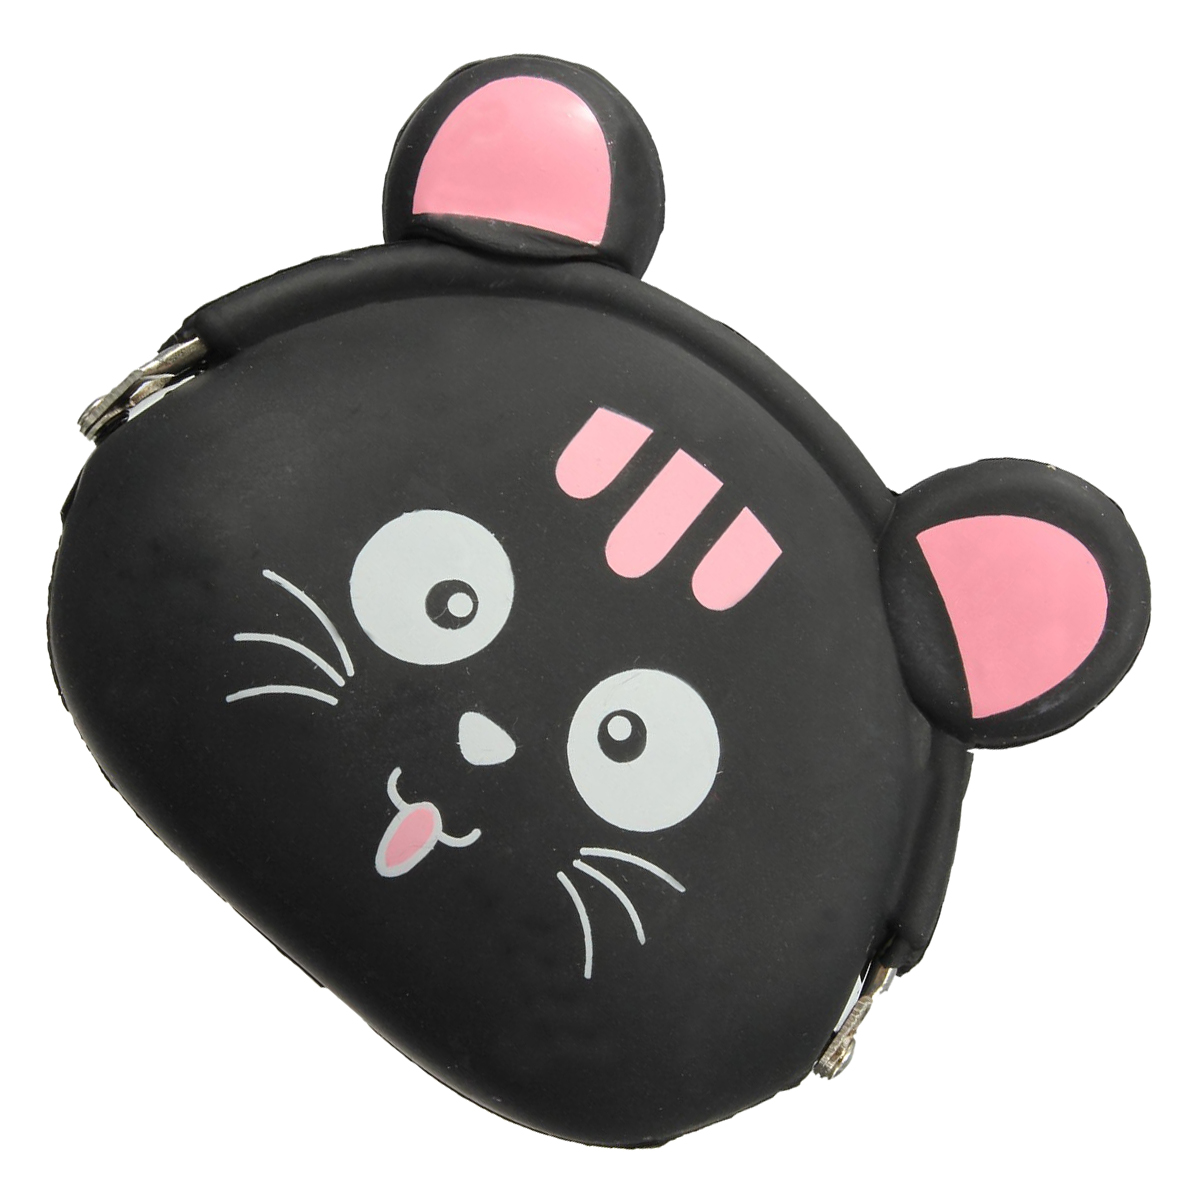 Top Sale BISM-Women Girls Wallet Kawaii Cute Cartoon Animal Silicone Jelly Coin Bag Purse Kids Gift Black cat